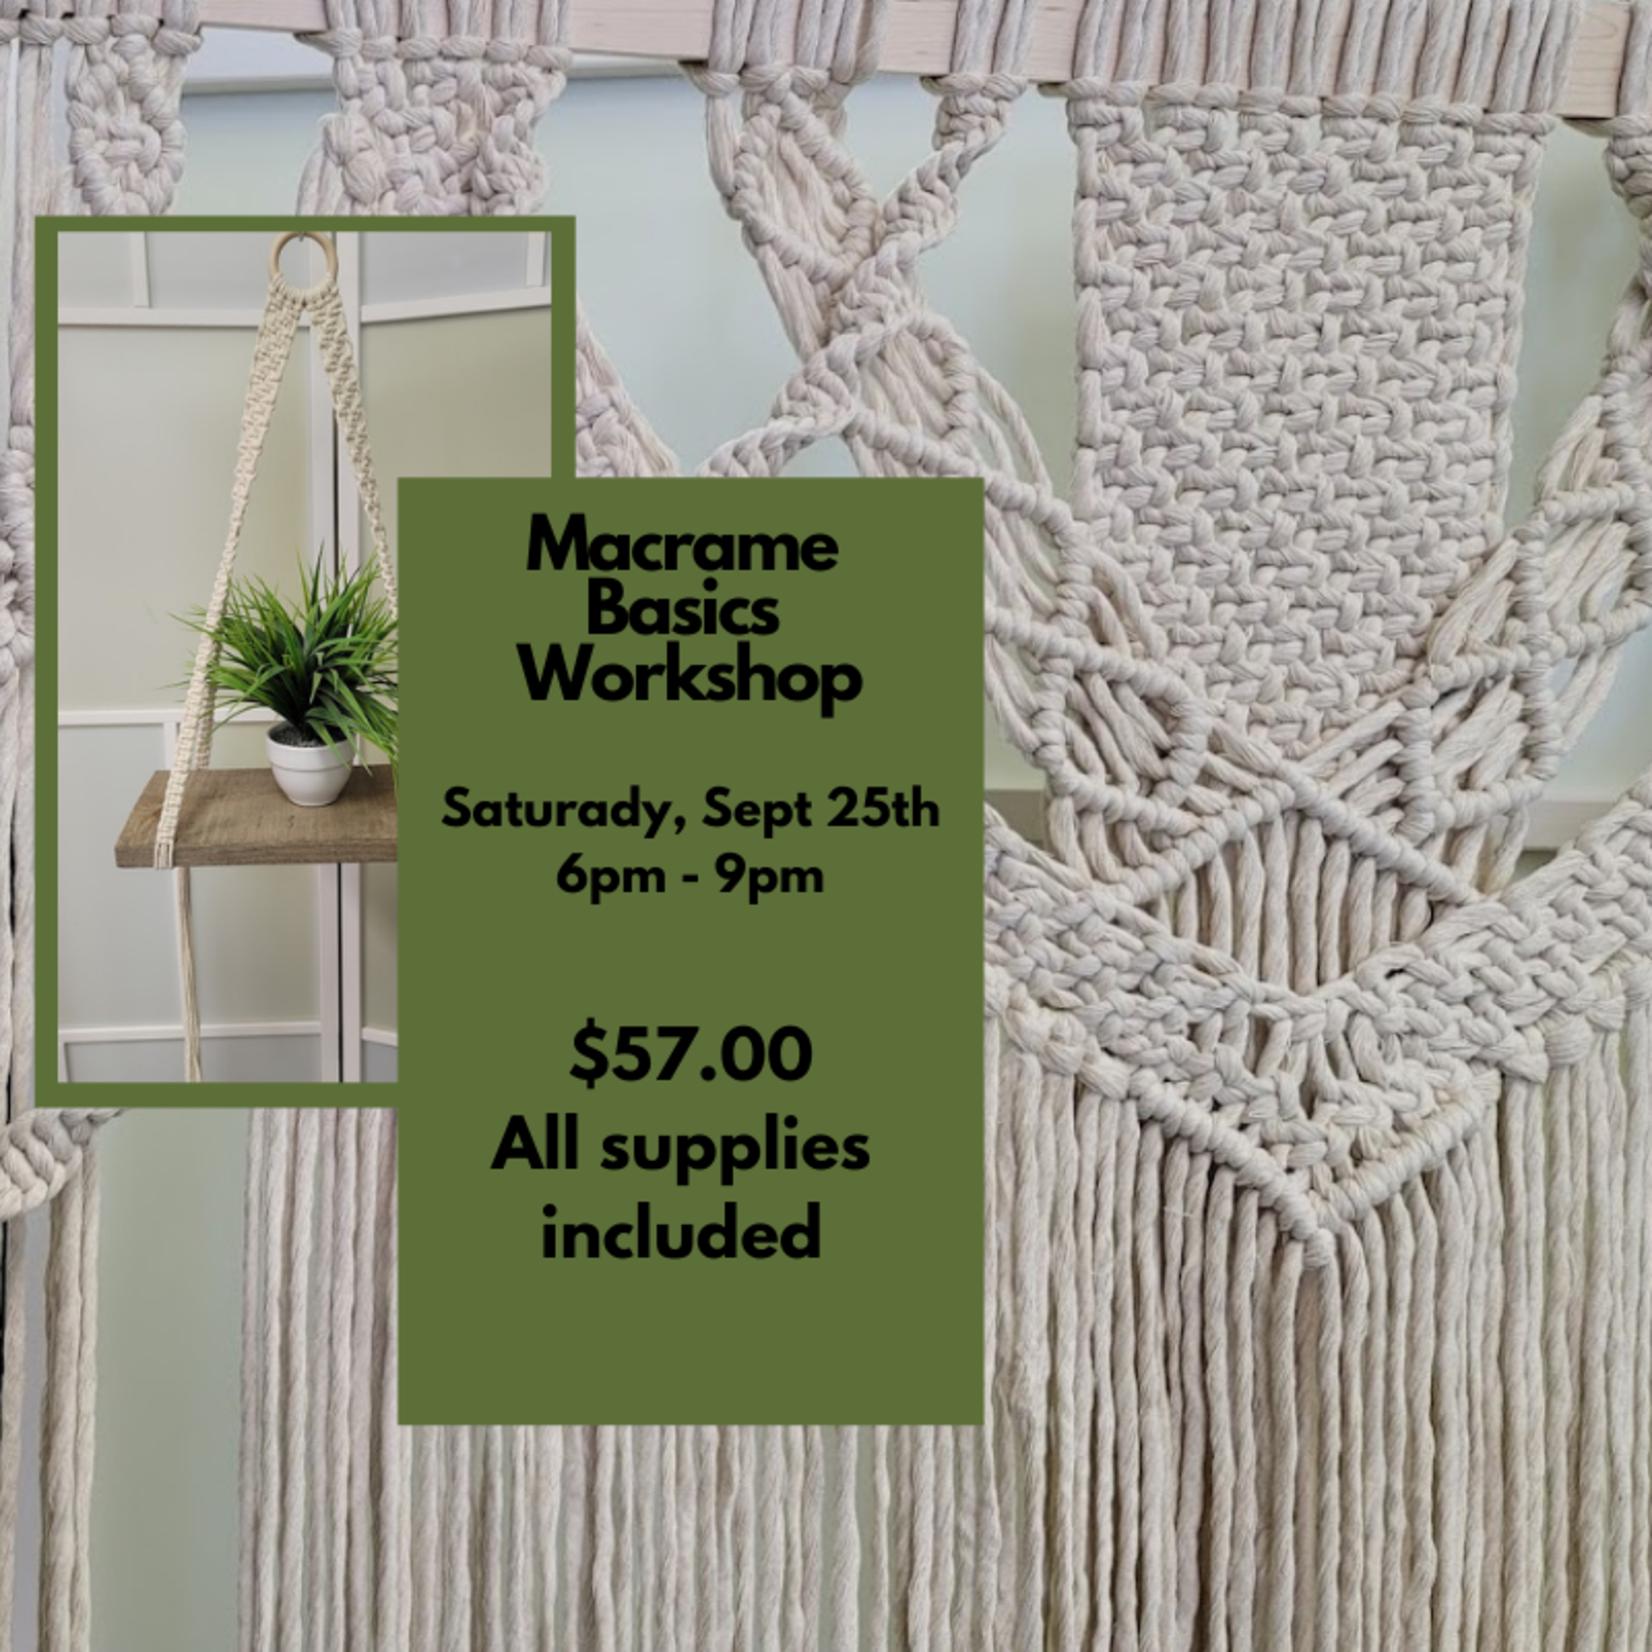 Macrame Basics Workshop - September 25th 6pm